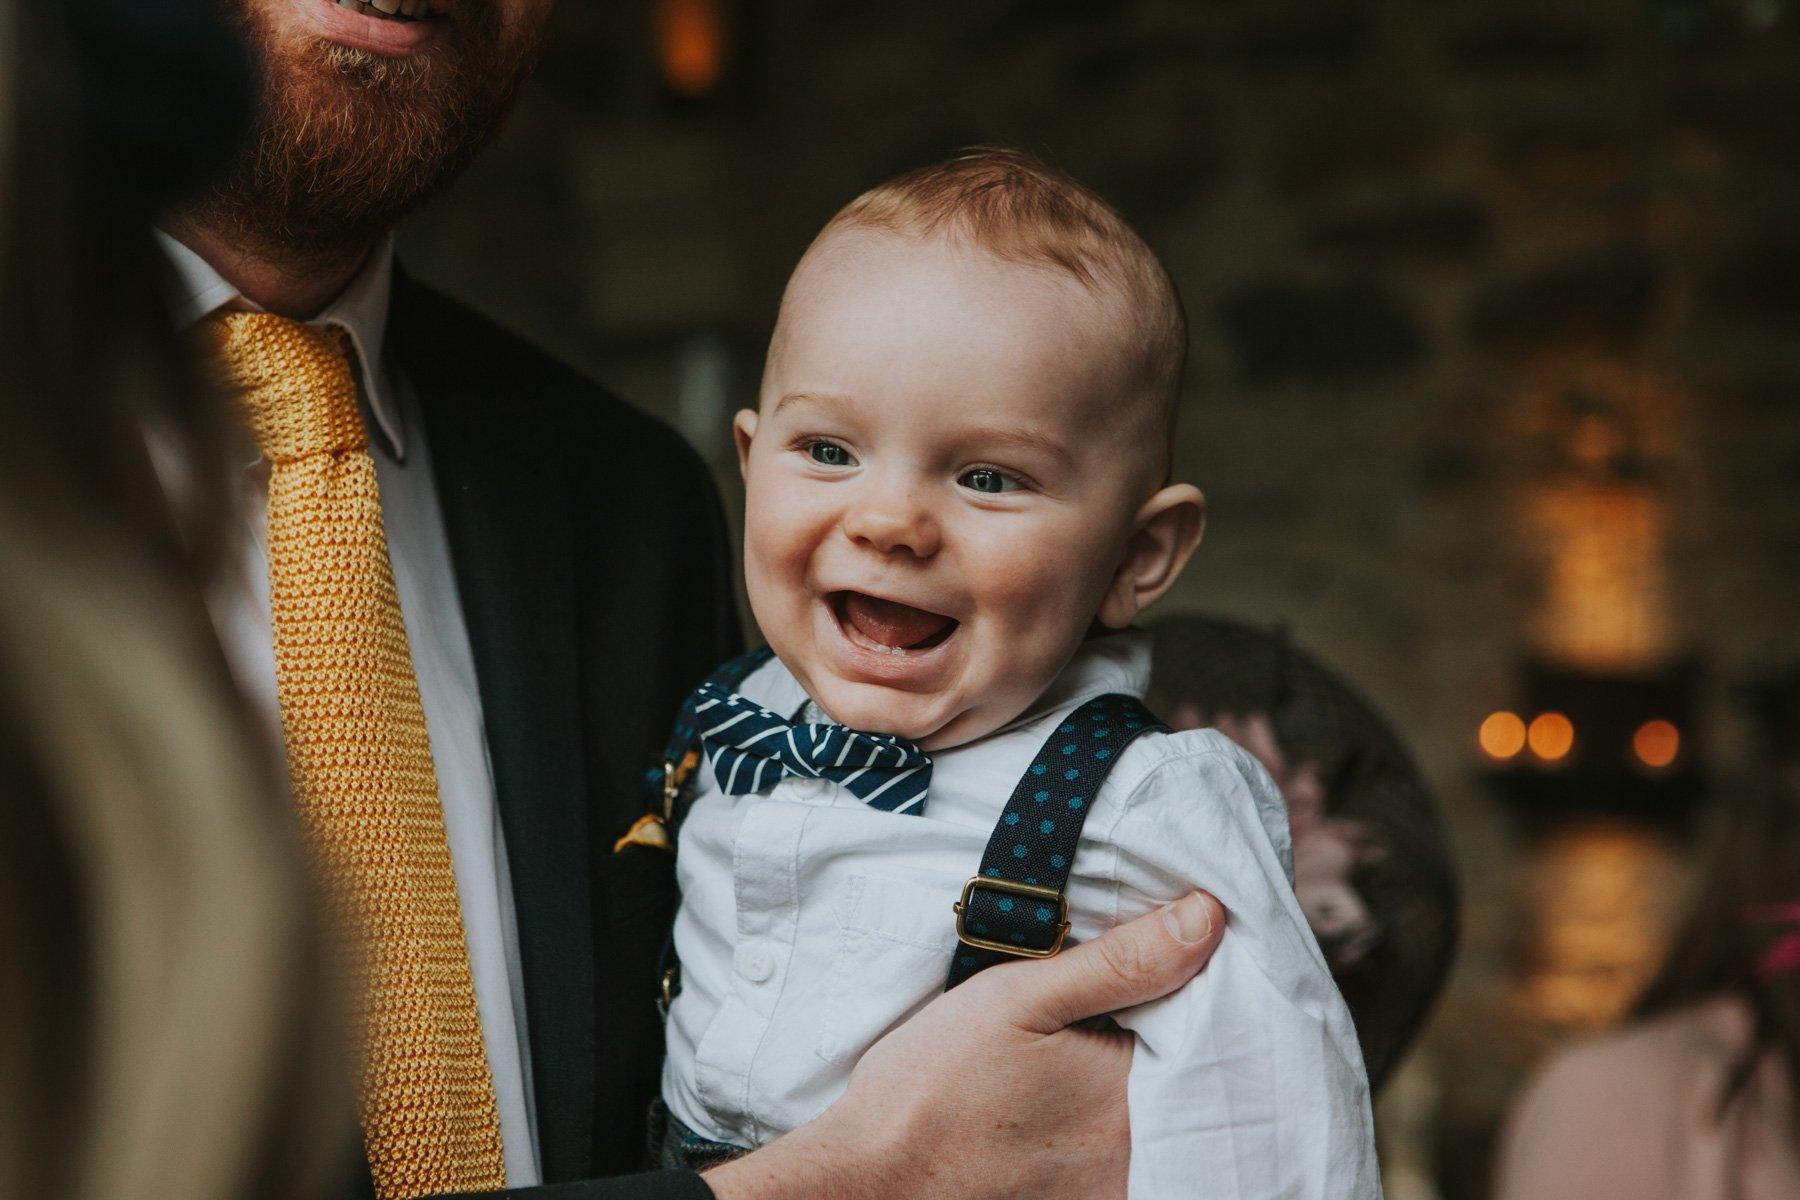 Healey Barn Wedding Photographer - baby guest smiling